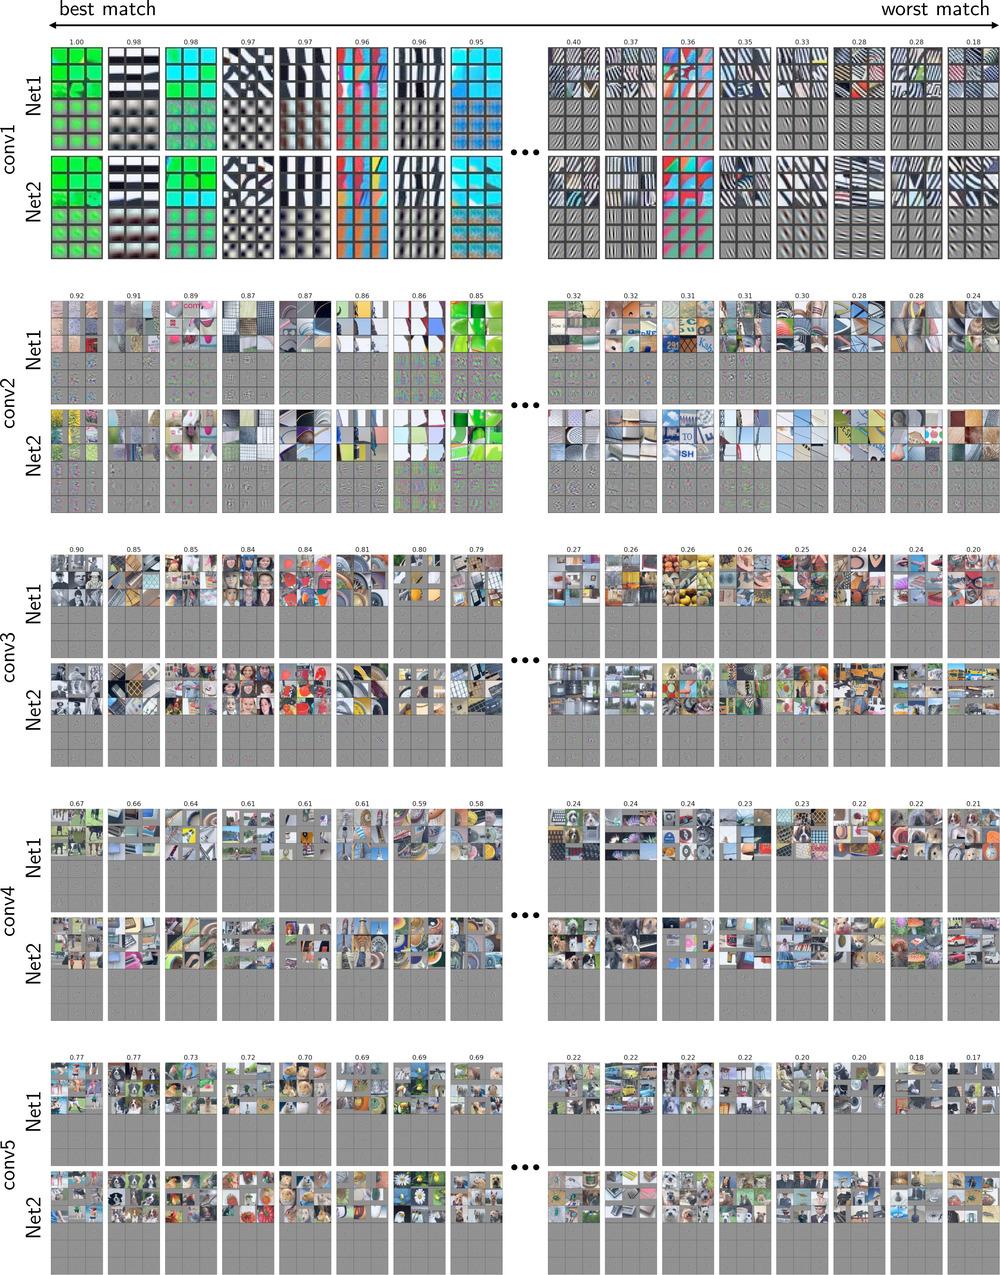 Conv12345 matches